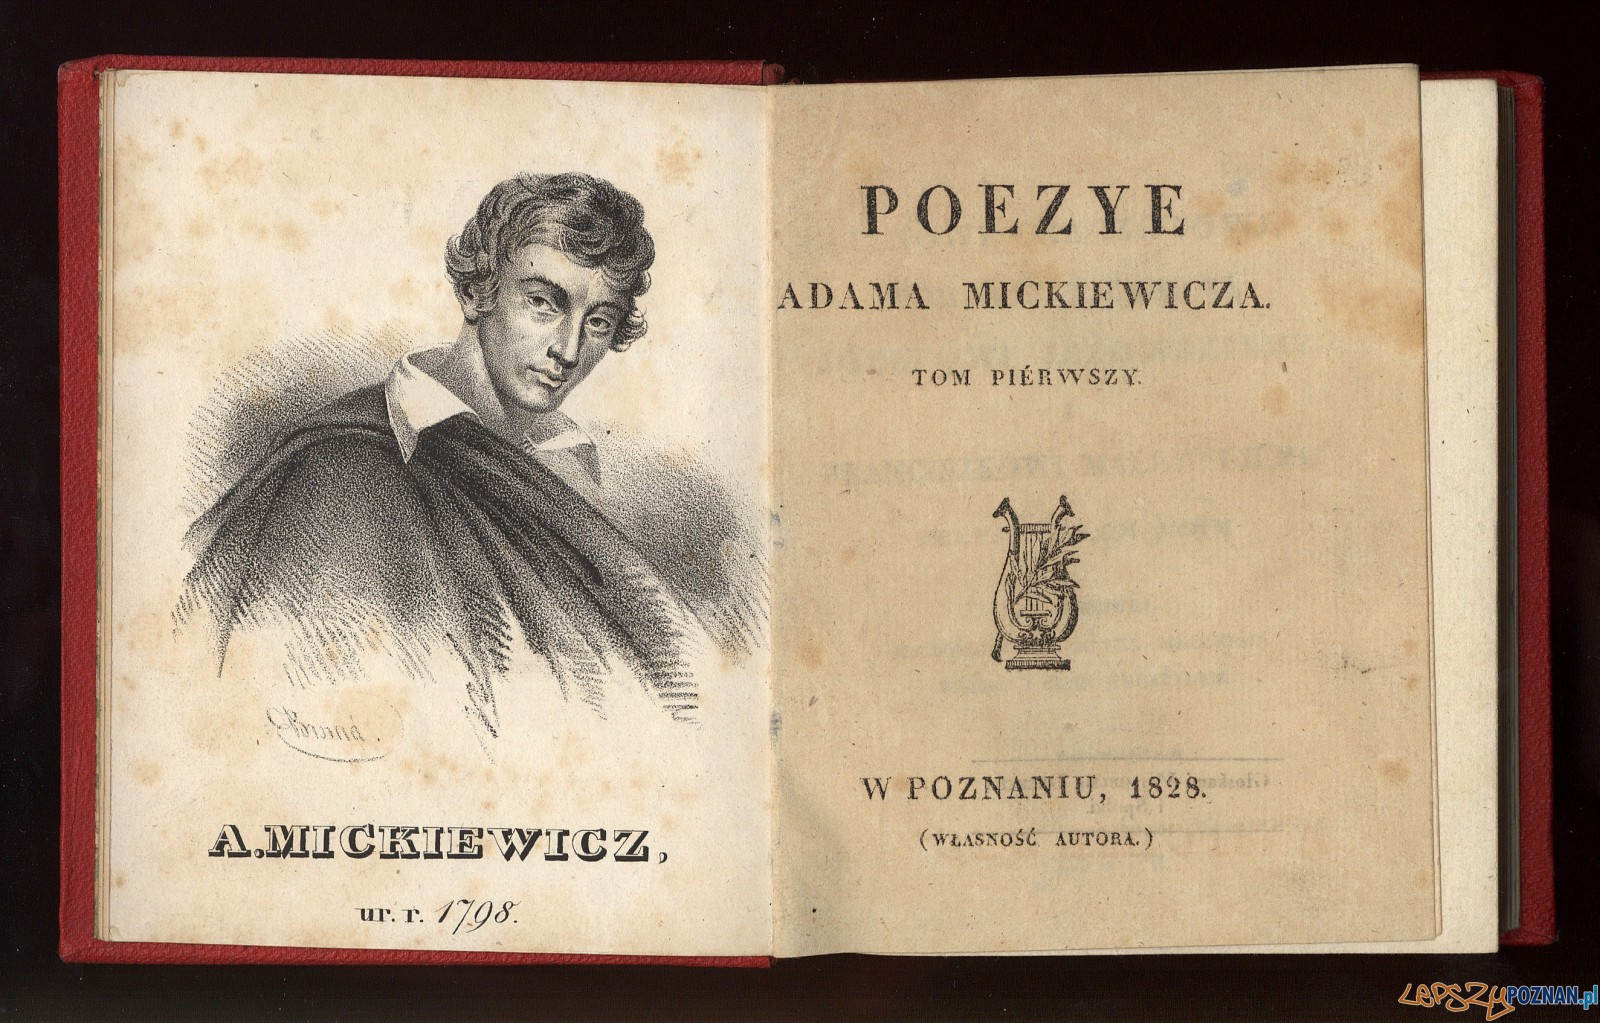 Poezye Adama Mickiewicza Foto: The European Library